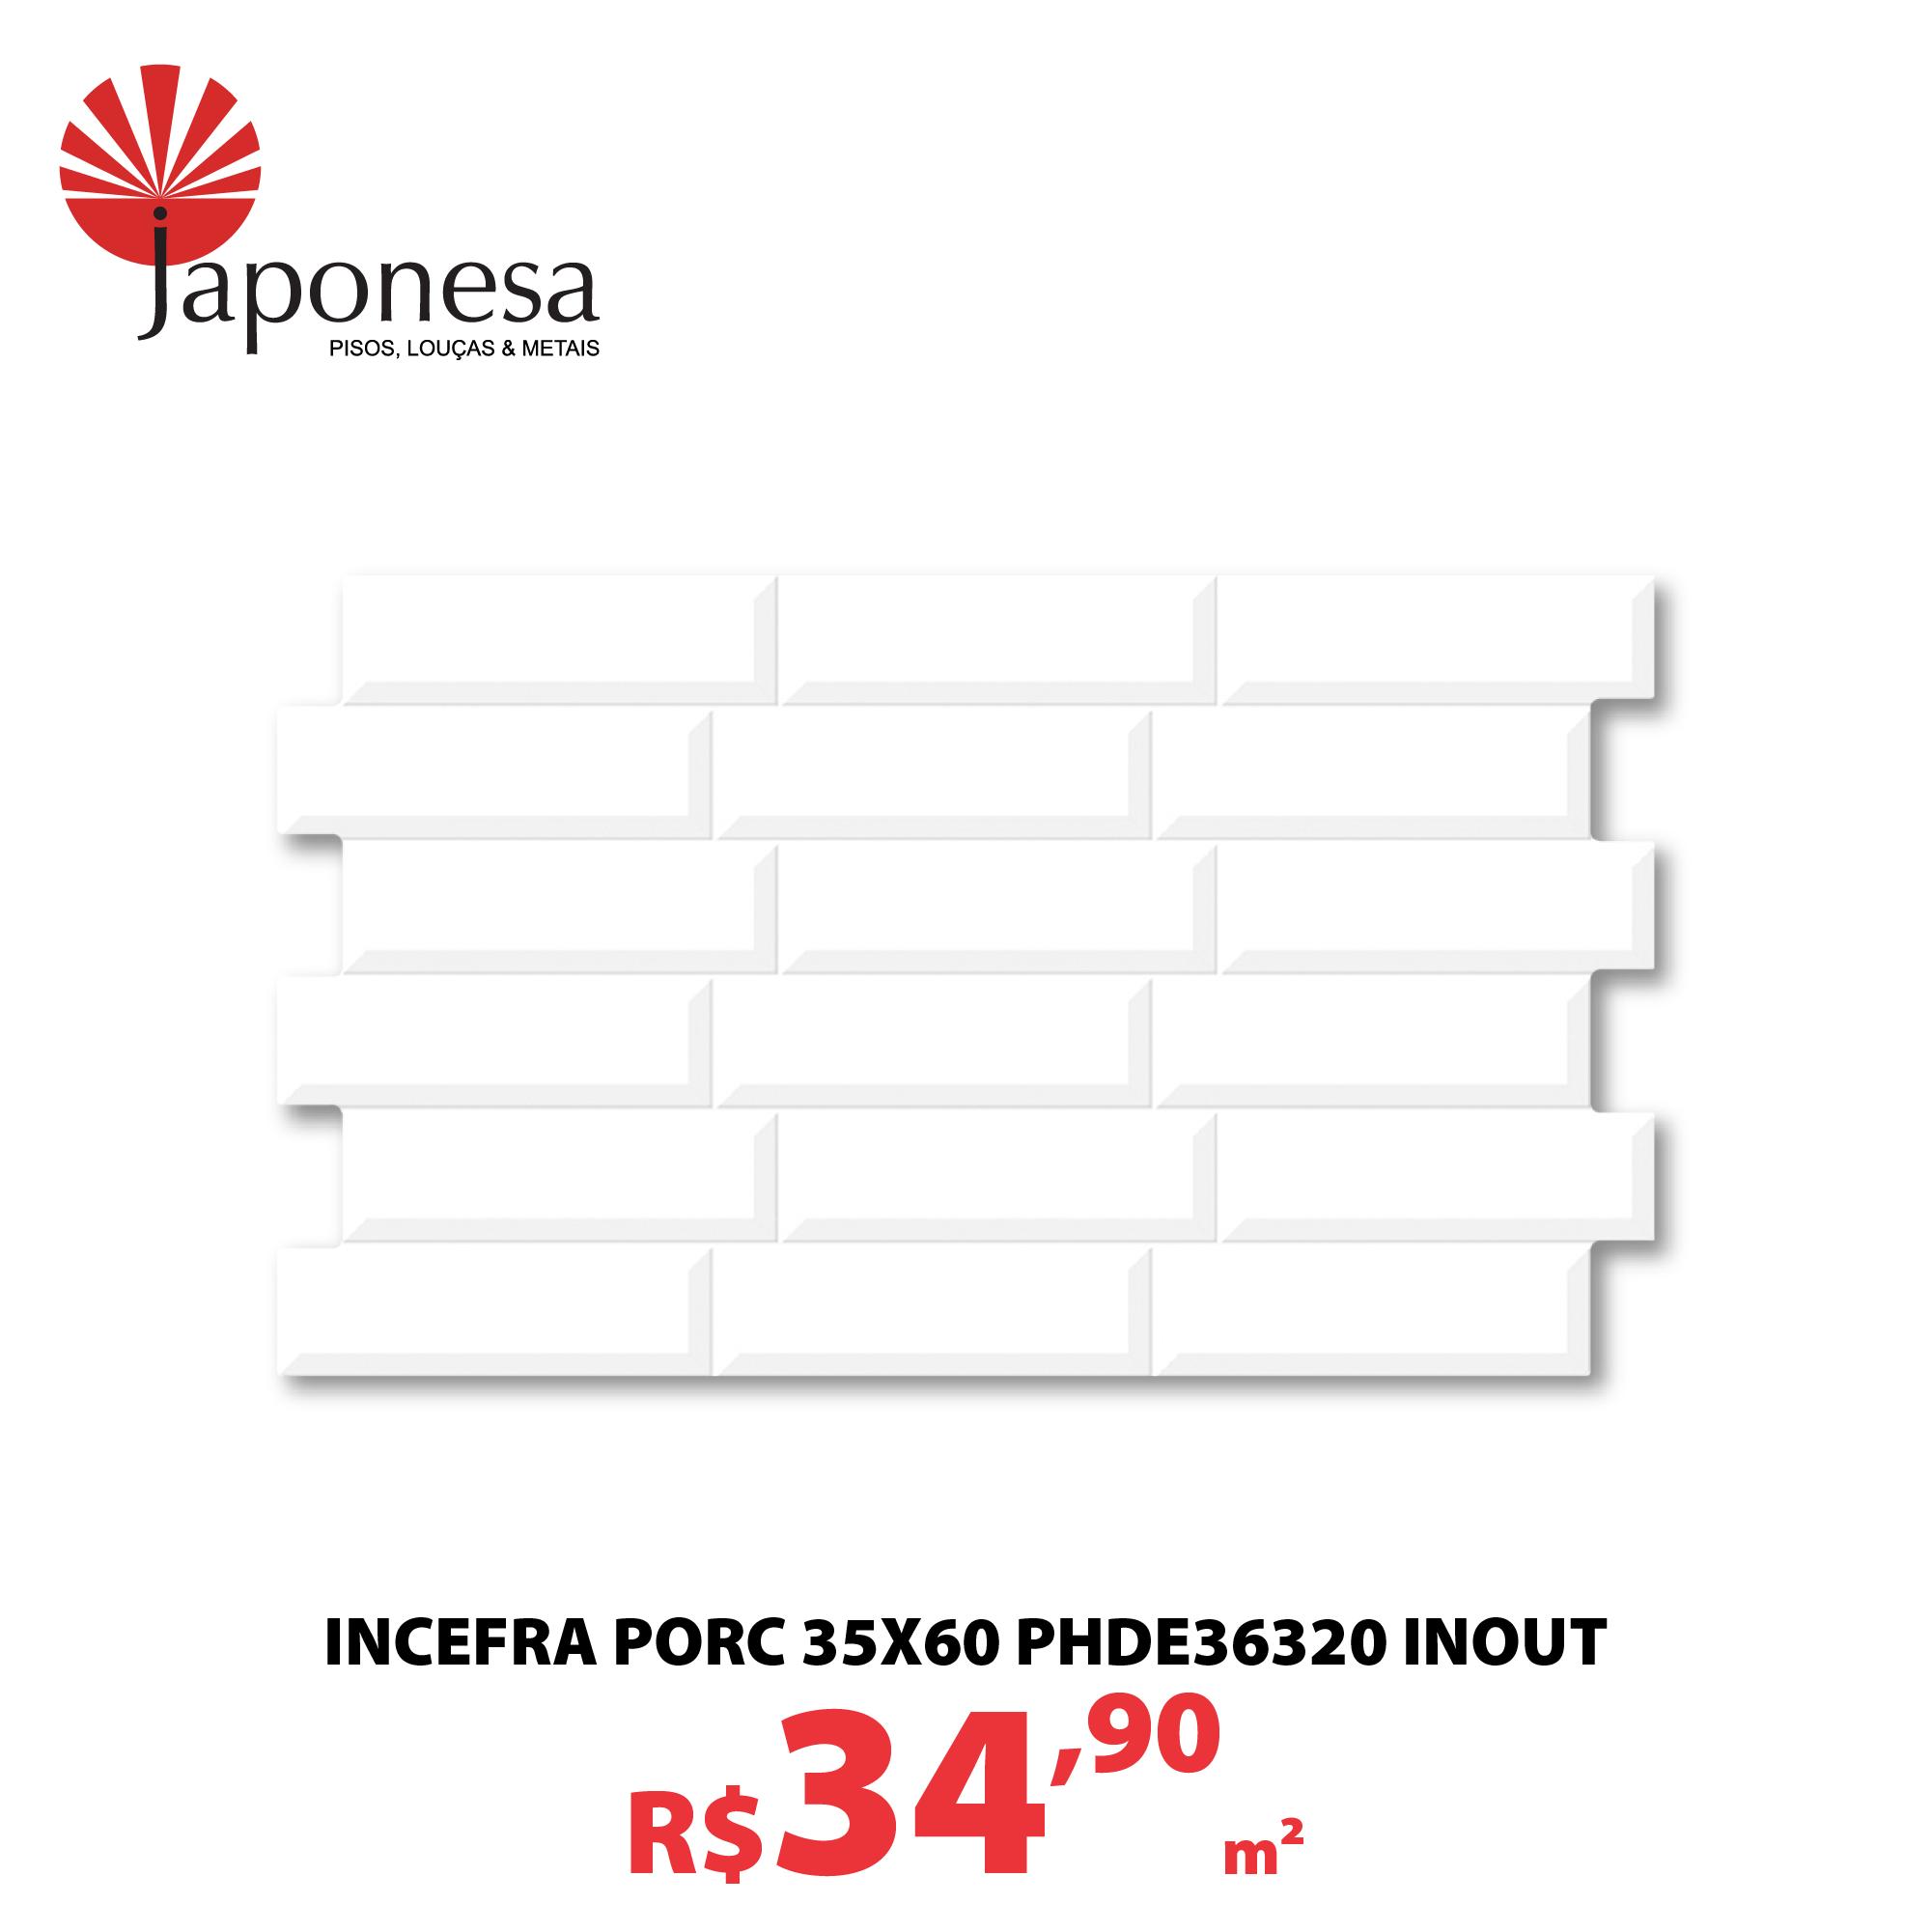 INCEFRA PORC 35X60 PHDE36320 INOUT